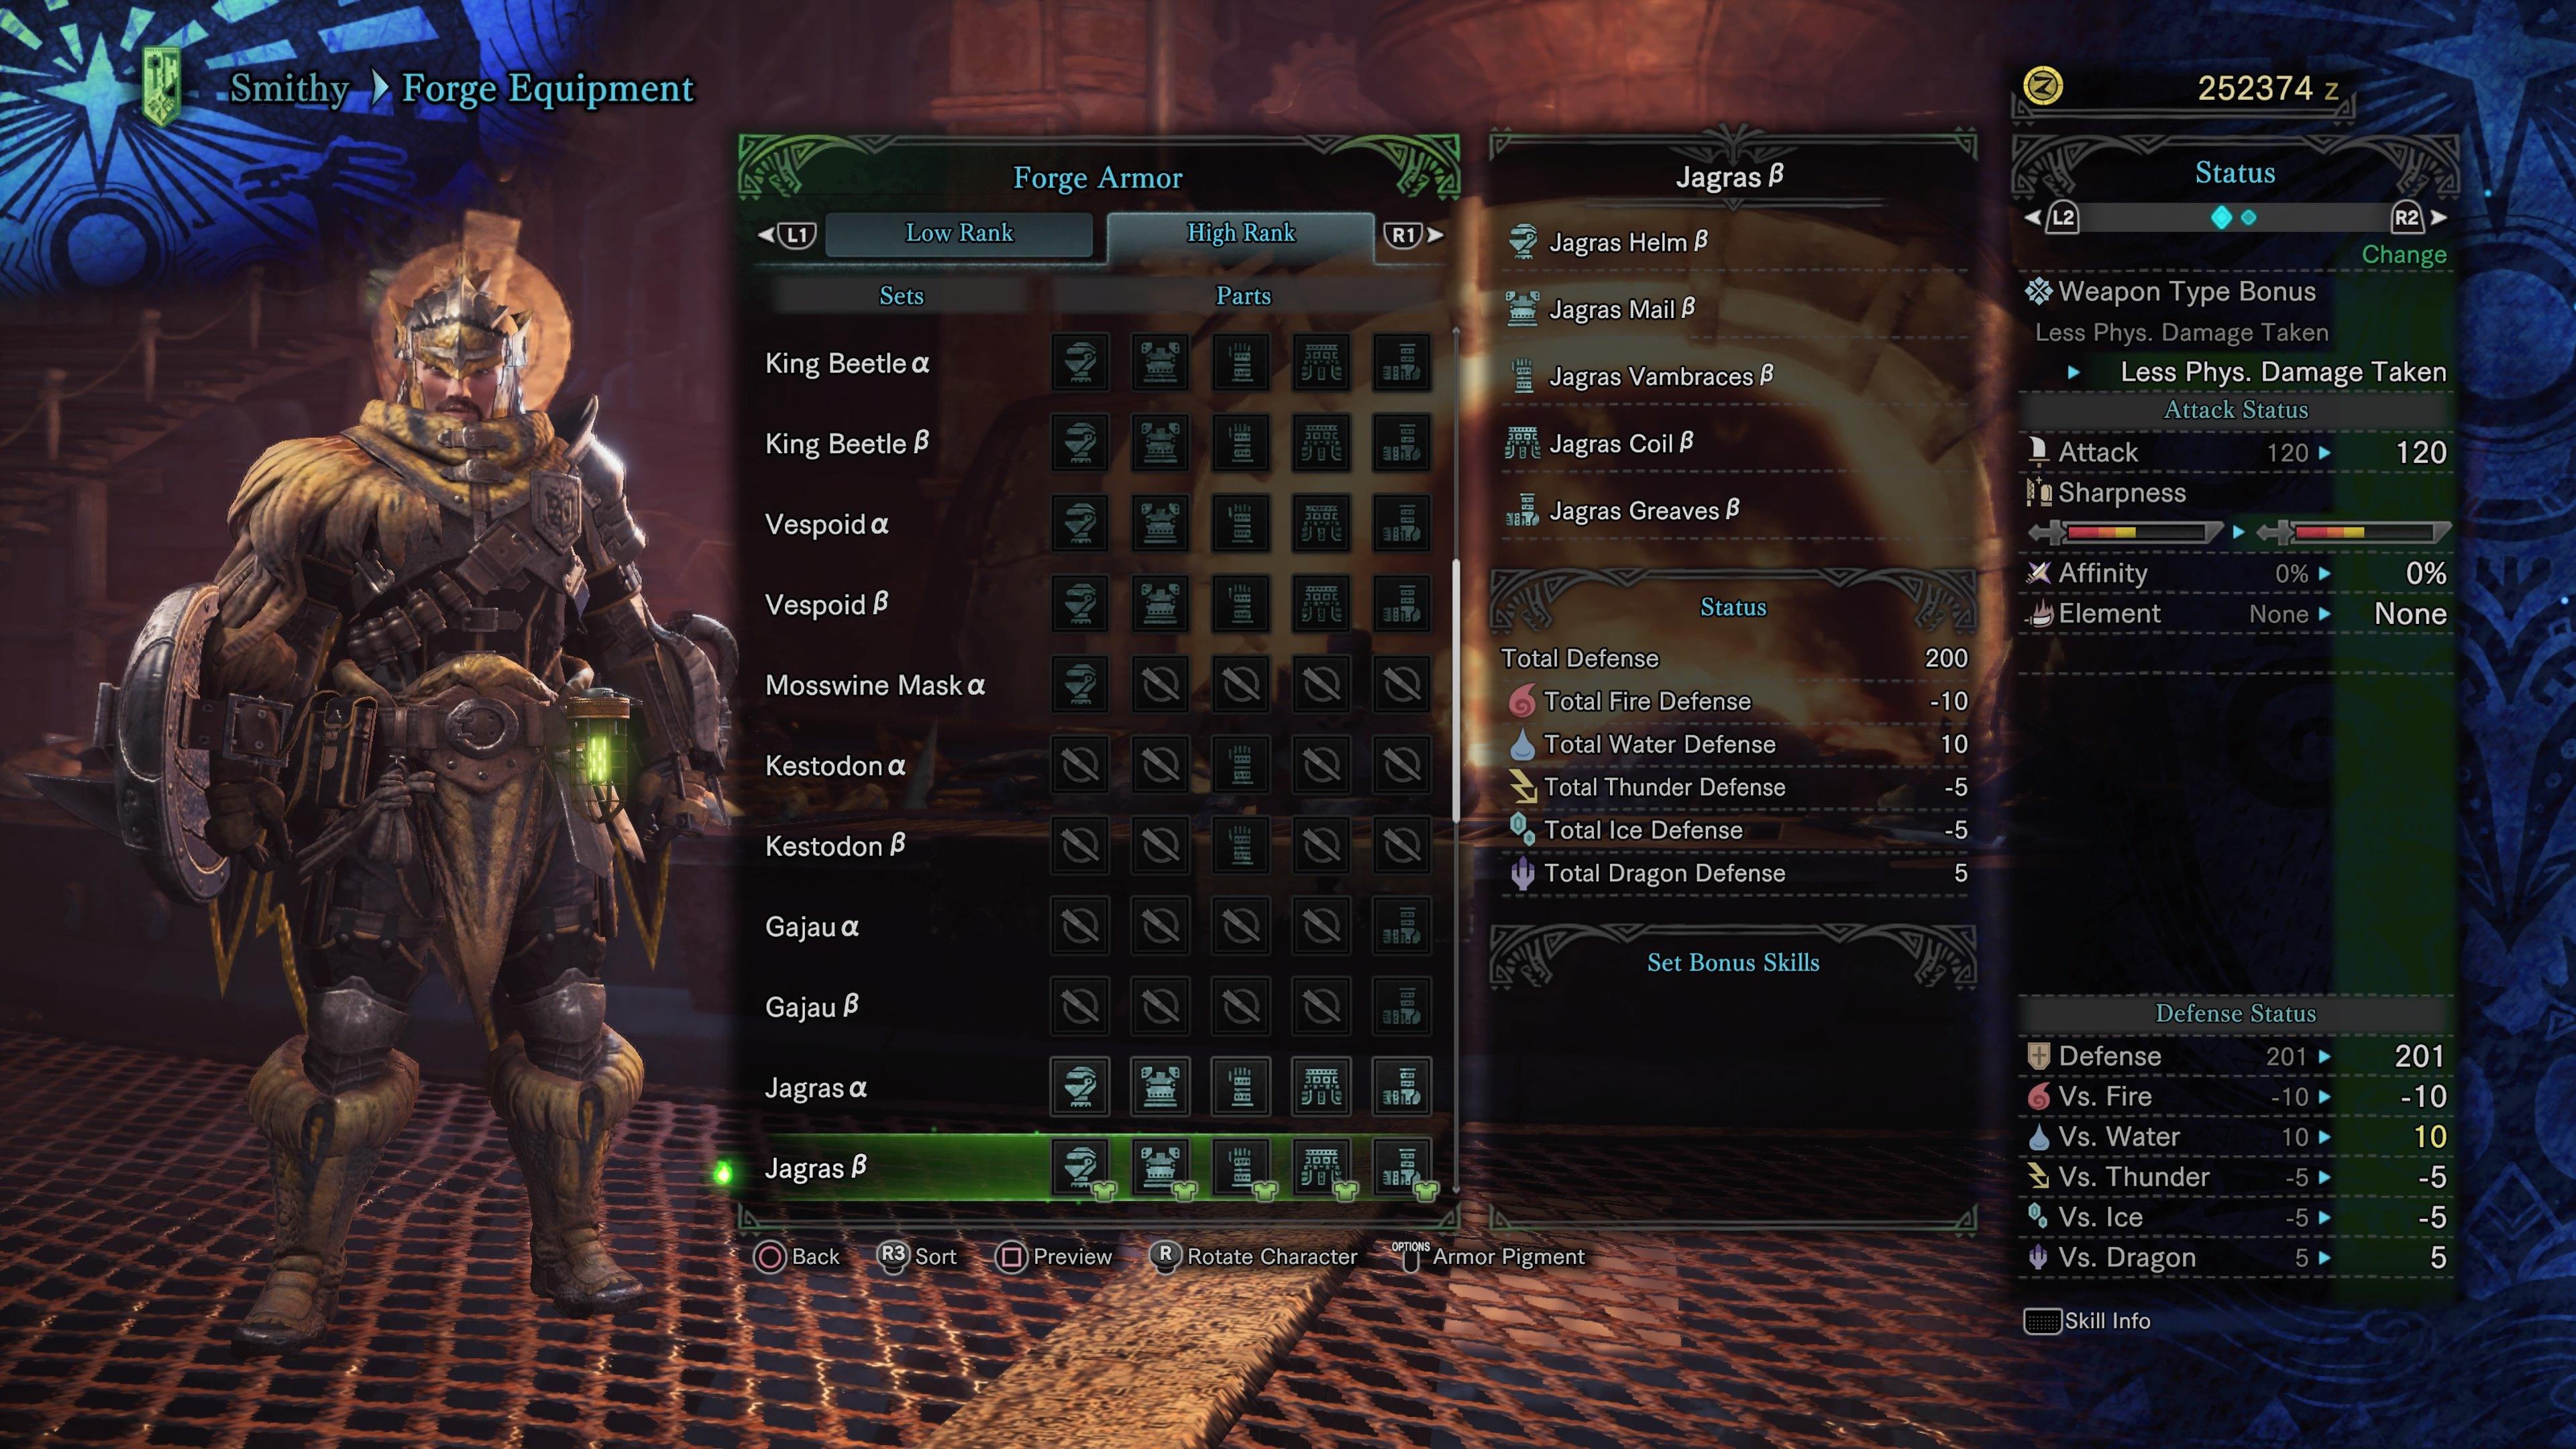 Monster Hunter: World Armor Sets - All High Rank Armor Sets